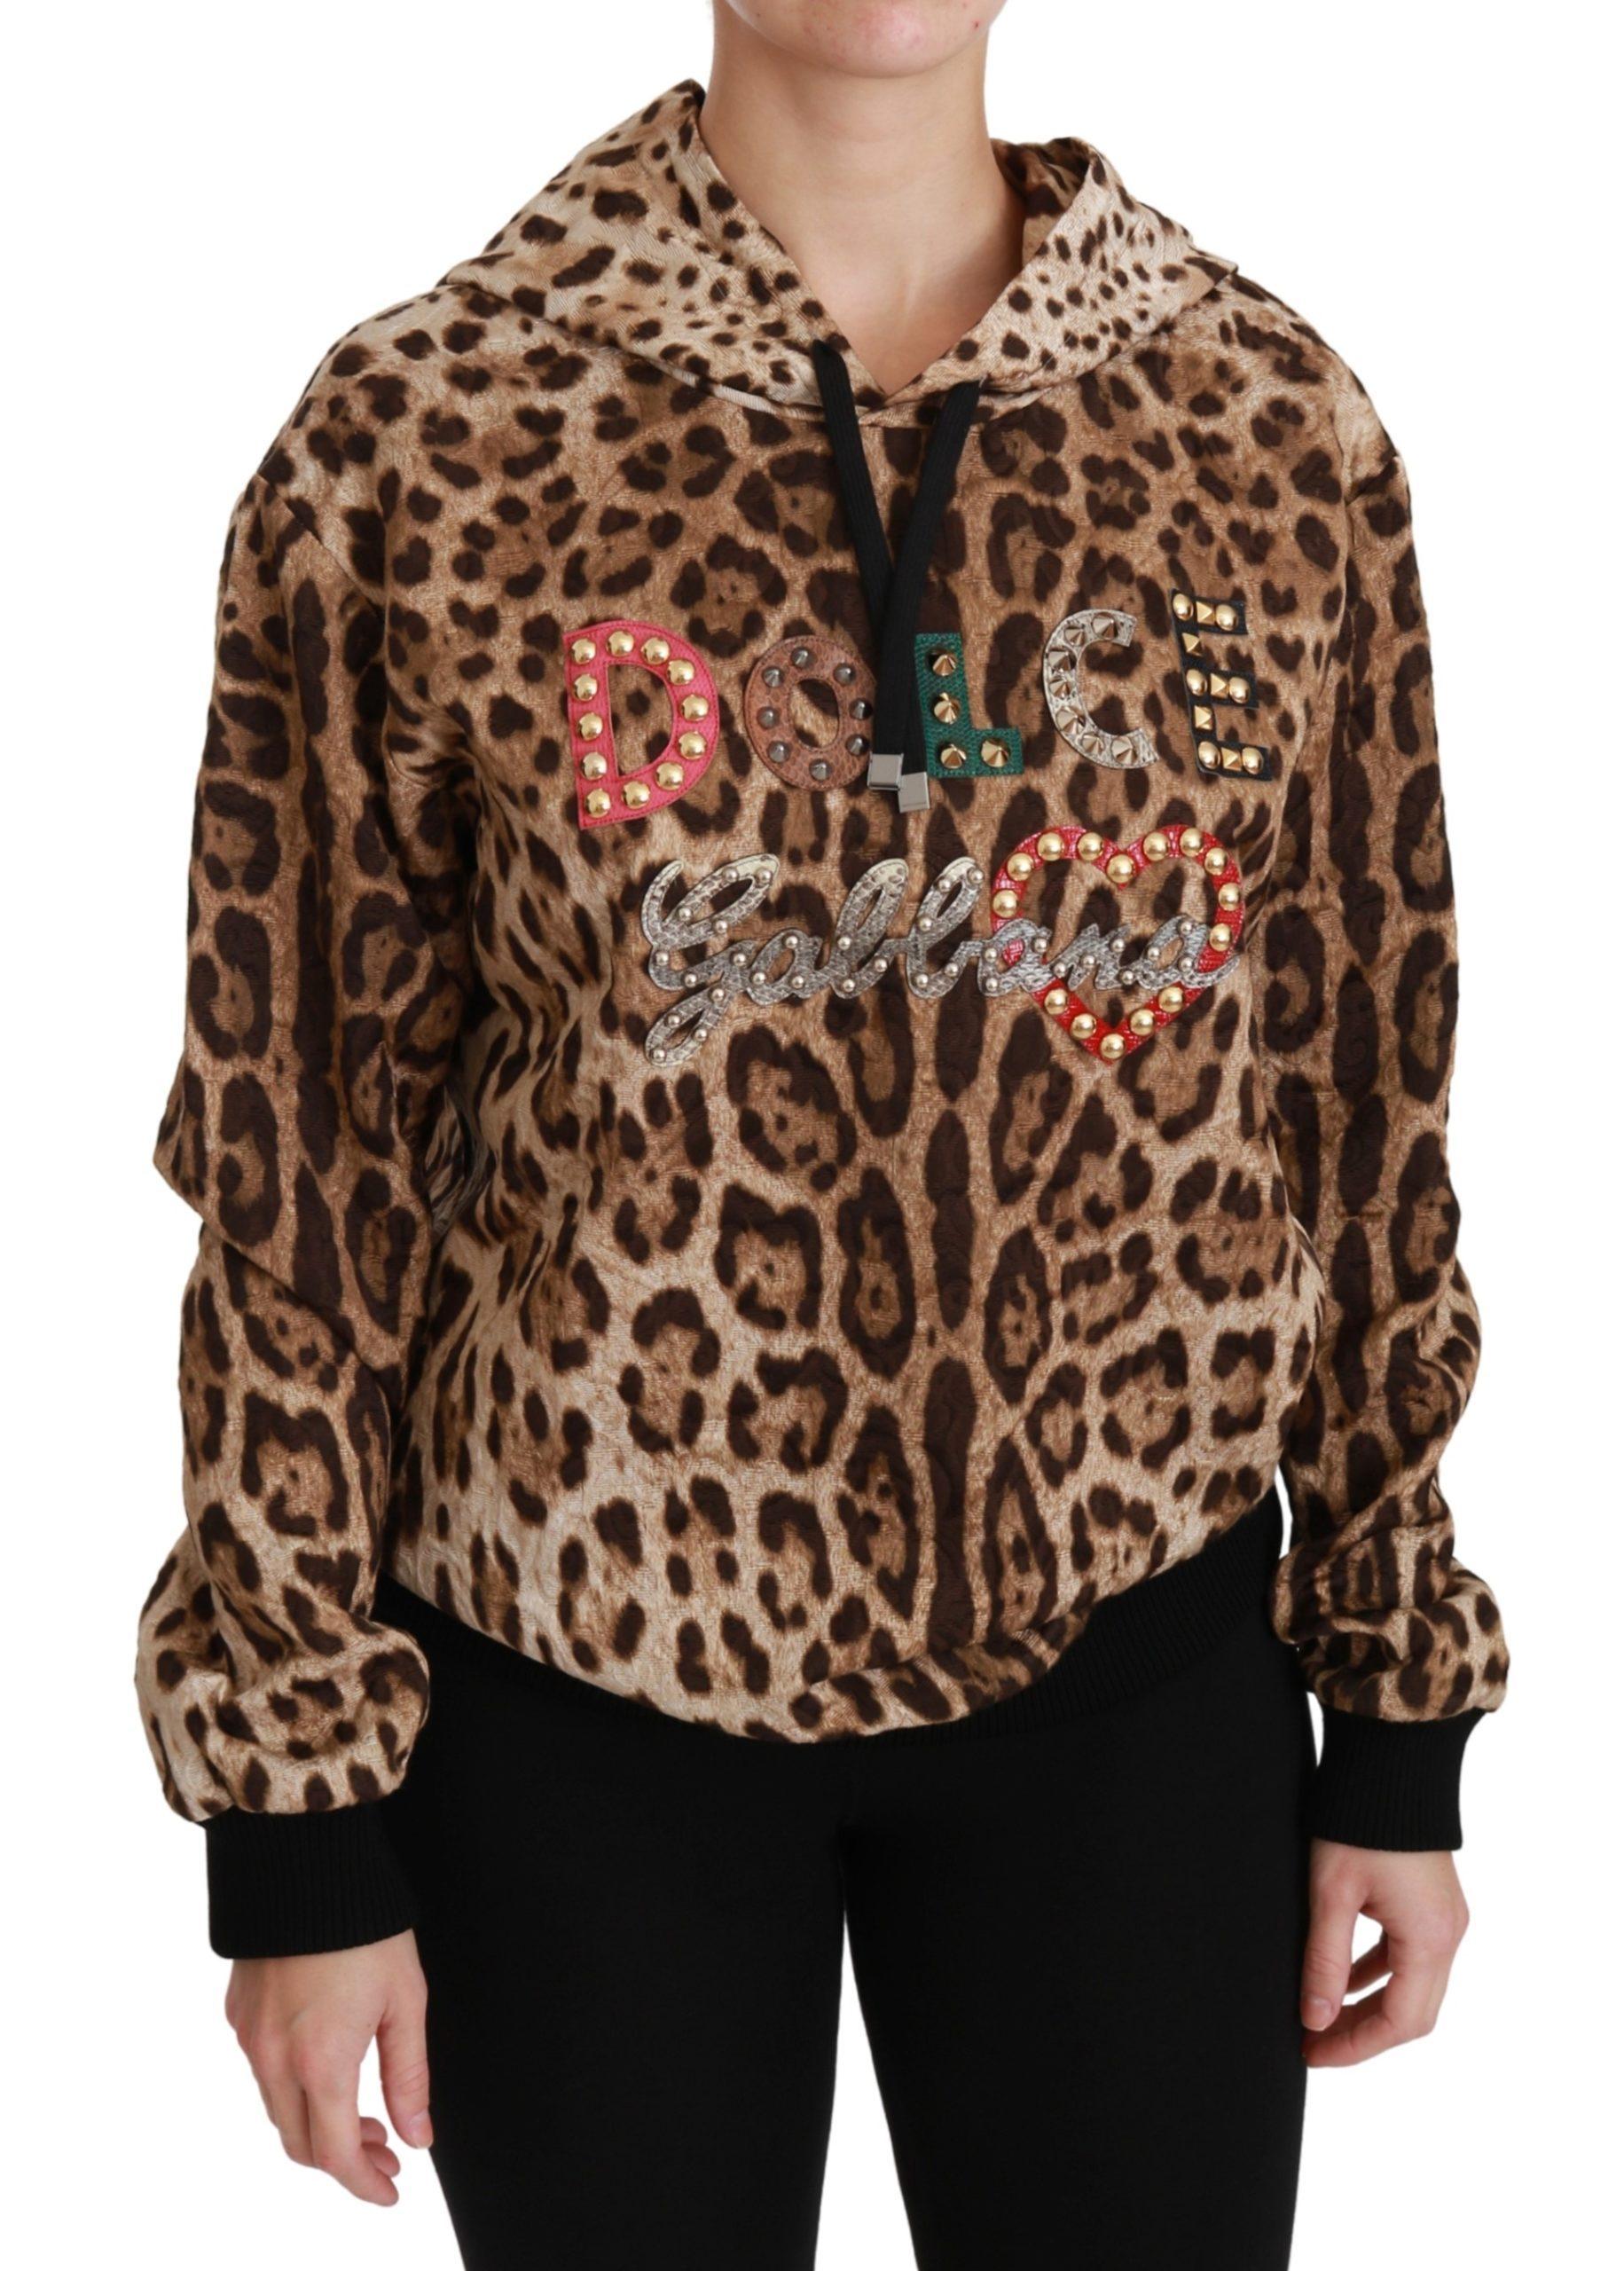 Dolce & Gabbana Women's Hooded Studded Ayers Leopard Sweater Brown TSH4420 - IT36   S